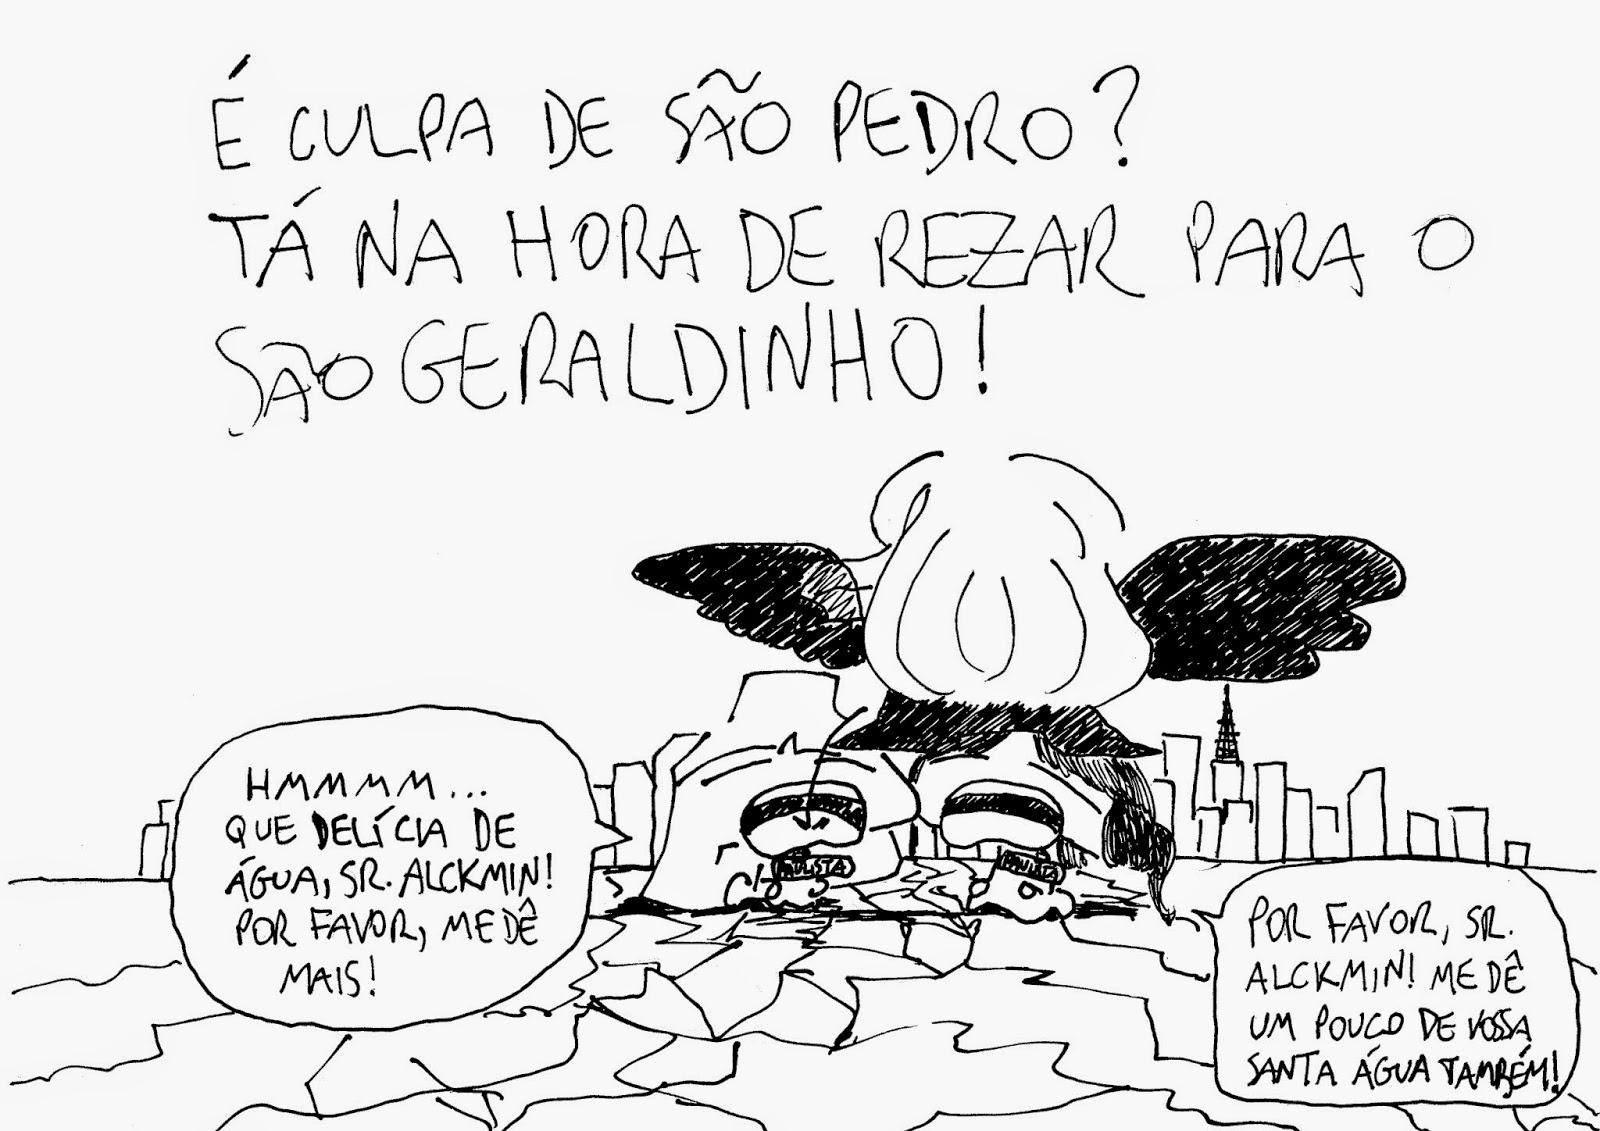 http://virgenskamikazes.blogspot.com.br/2015/01/sao-geraldinho-patrono-da-classe-media.html